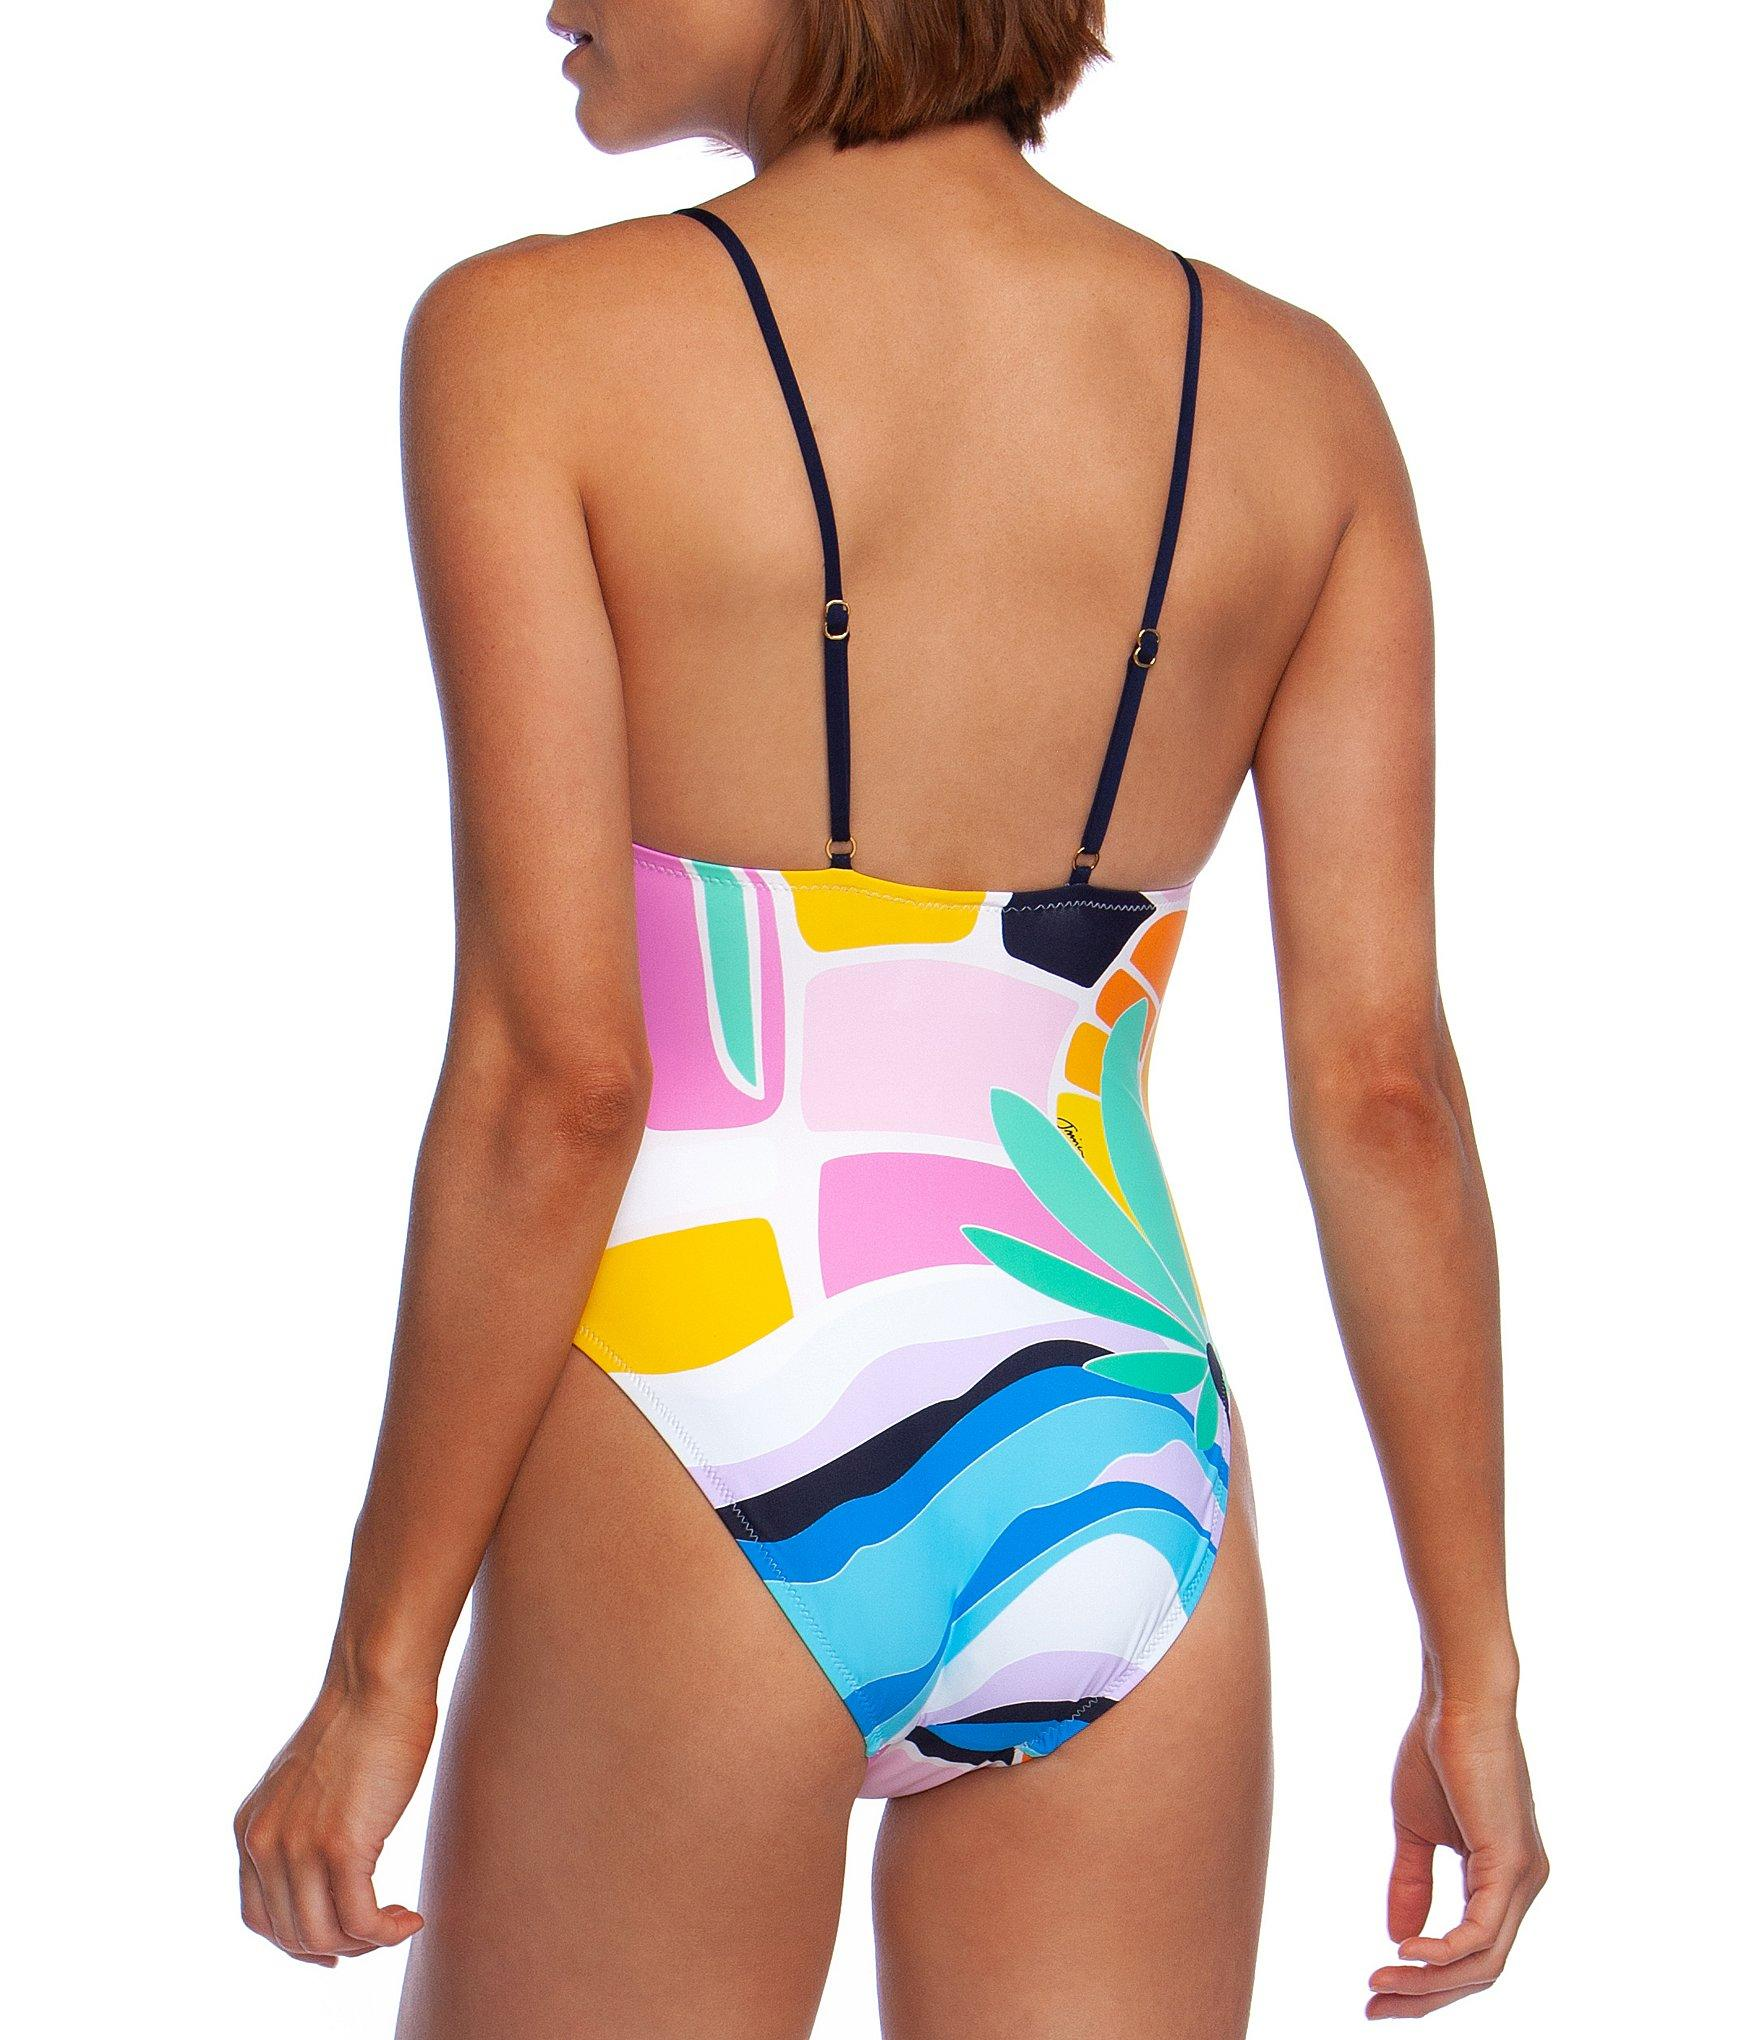 053cfc2466 Trina Turk Mosaic Sunrise High Leg One Piece Swimsuit - Lyst